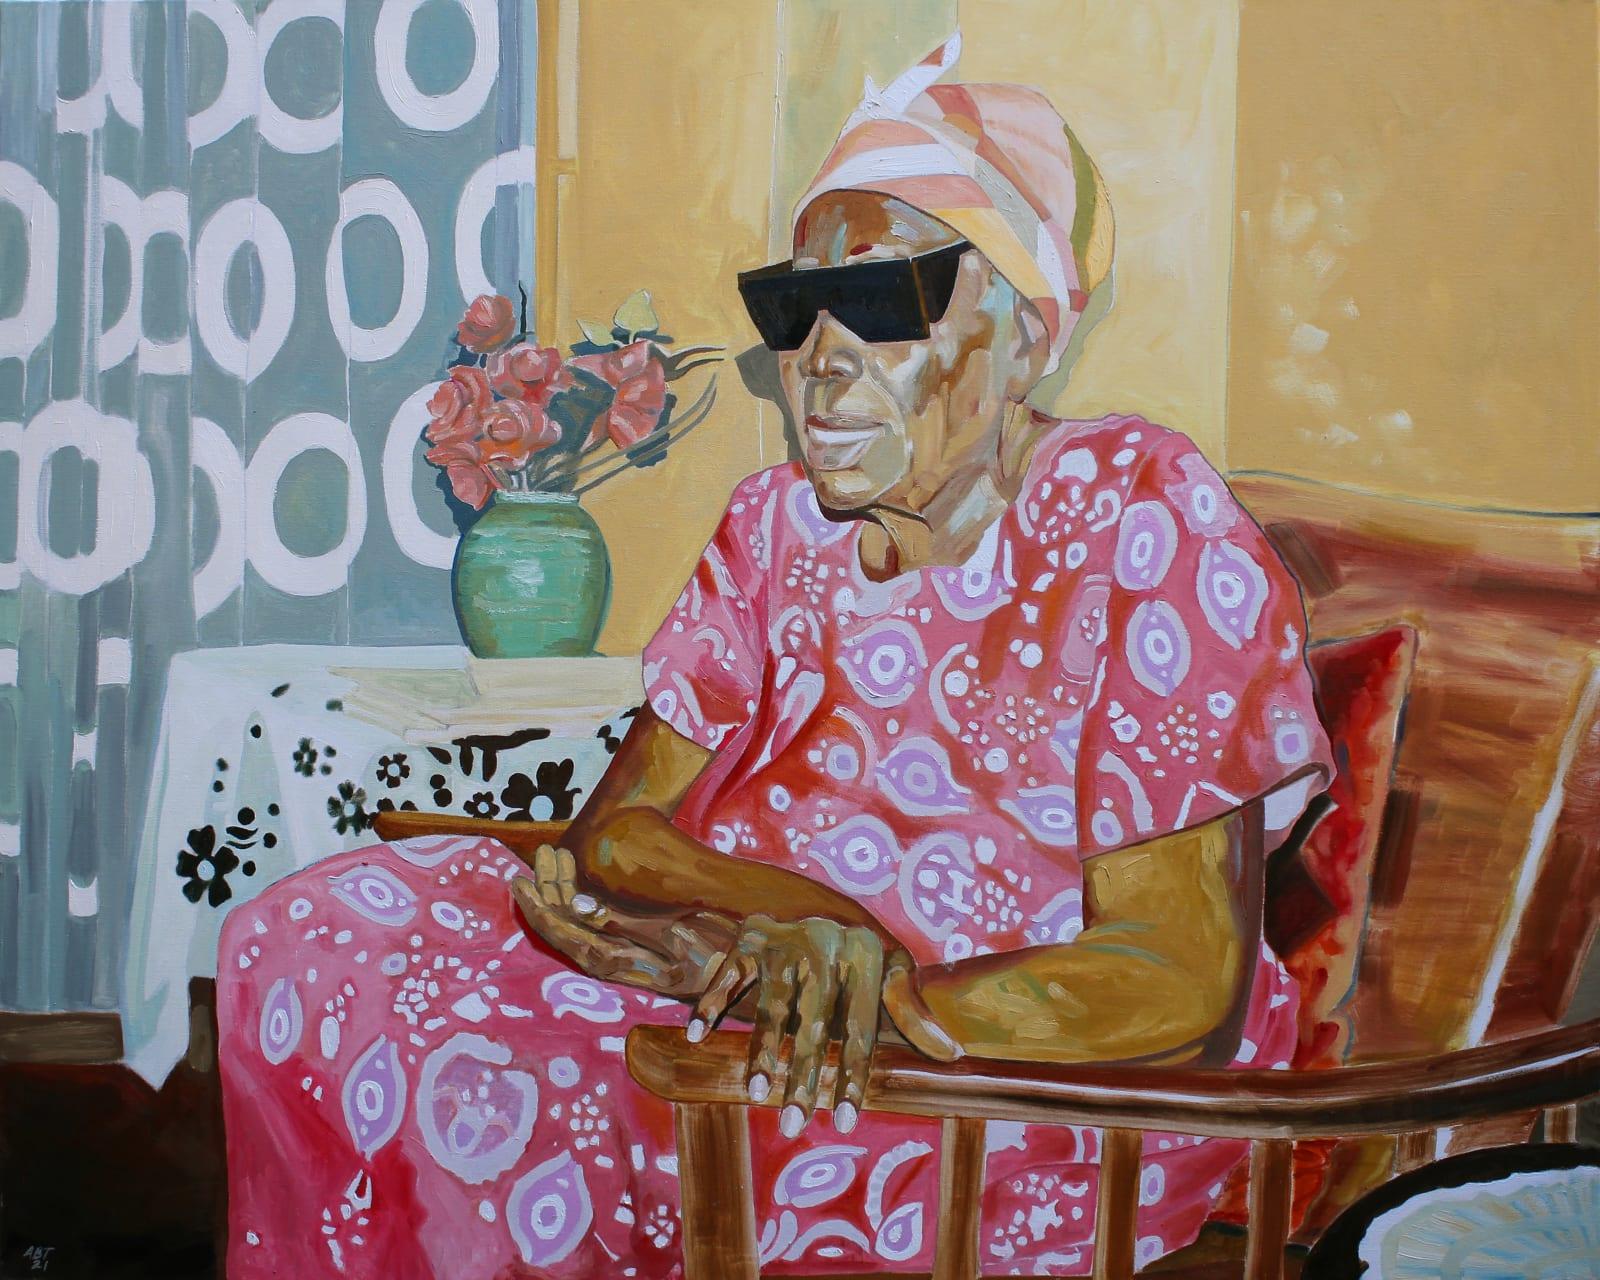 Arthur Timothy, Grandma's hands, 2021